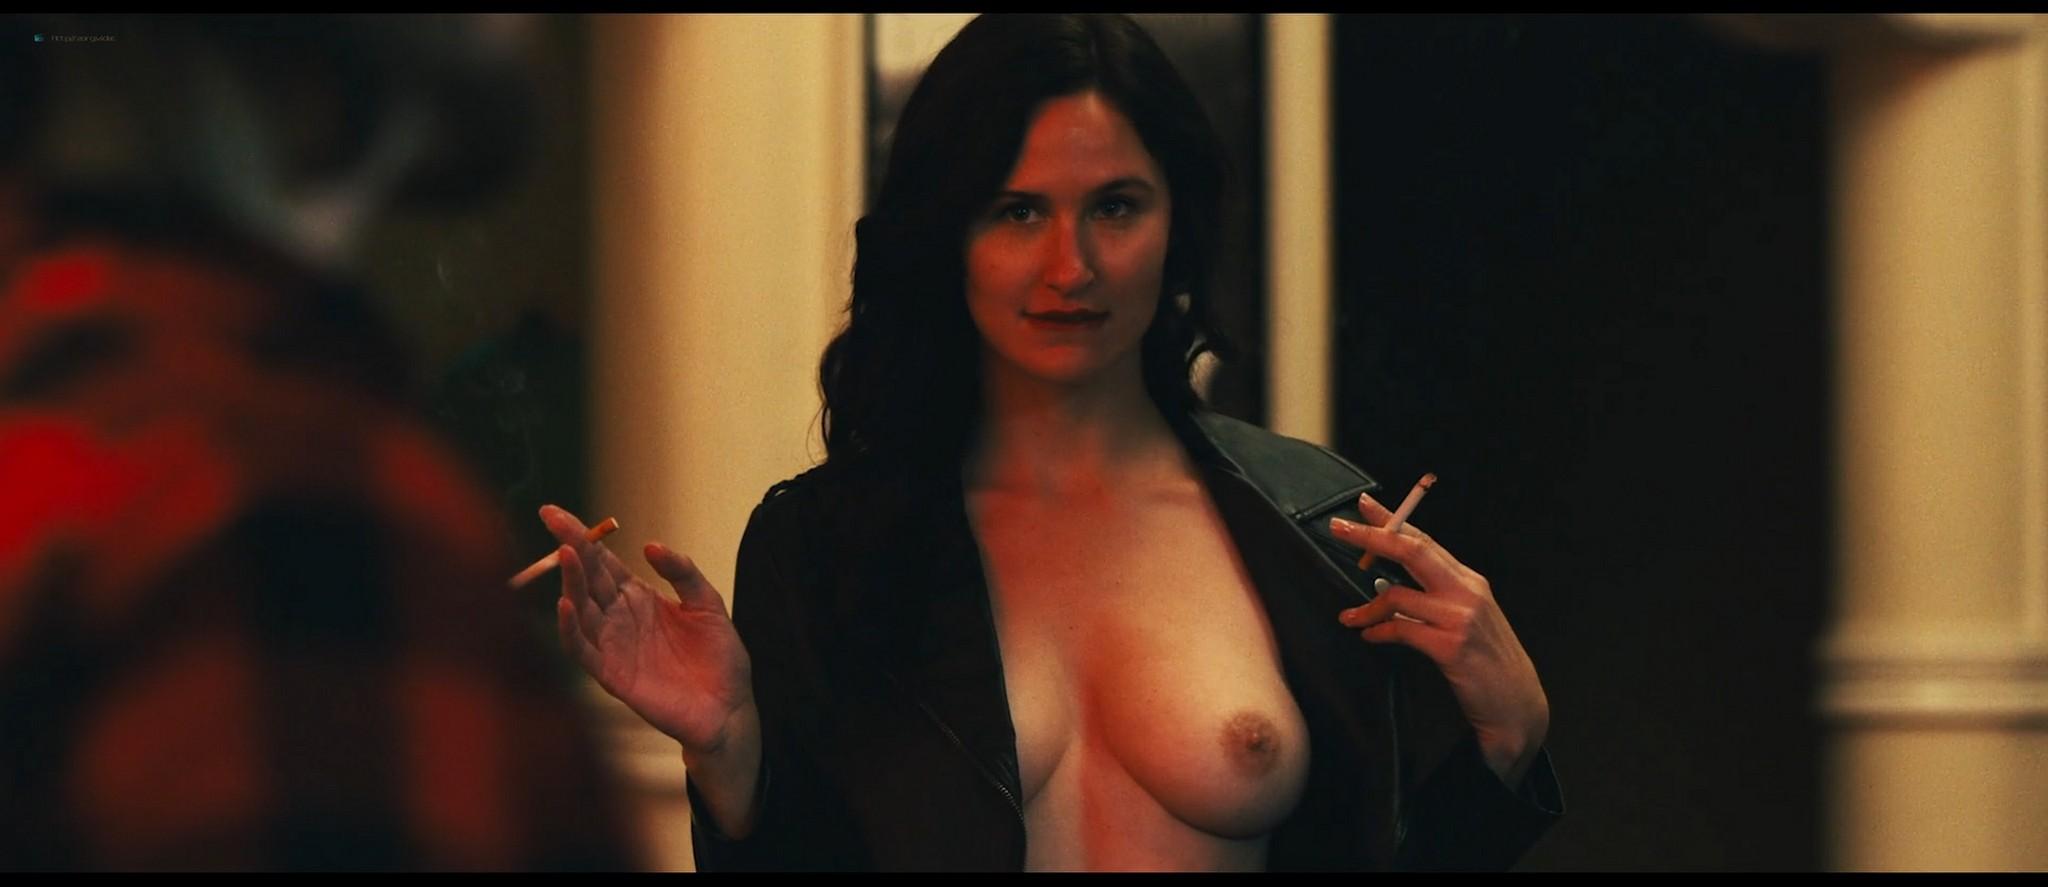 Katelyn Pearce nude full frontal Amber Paul nude sex - Porno (2019) HD 1080p (6)